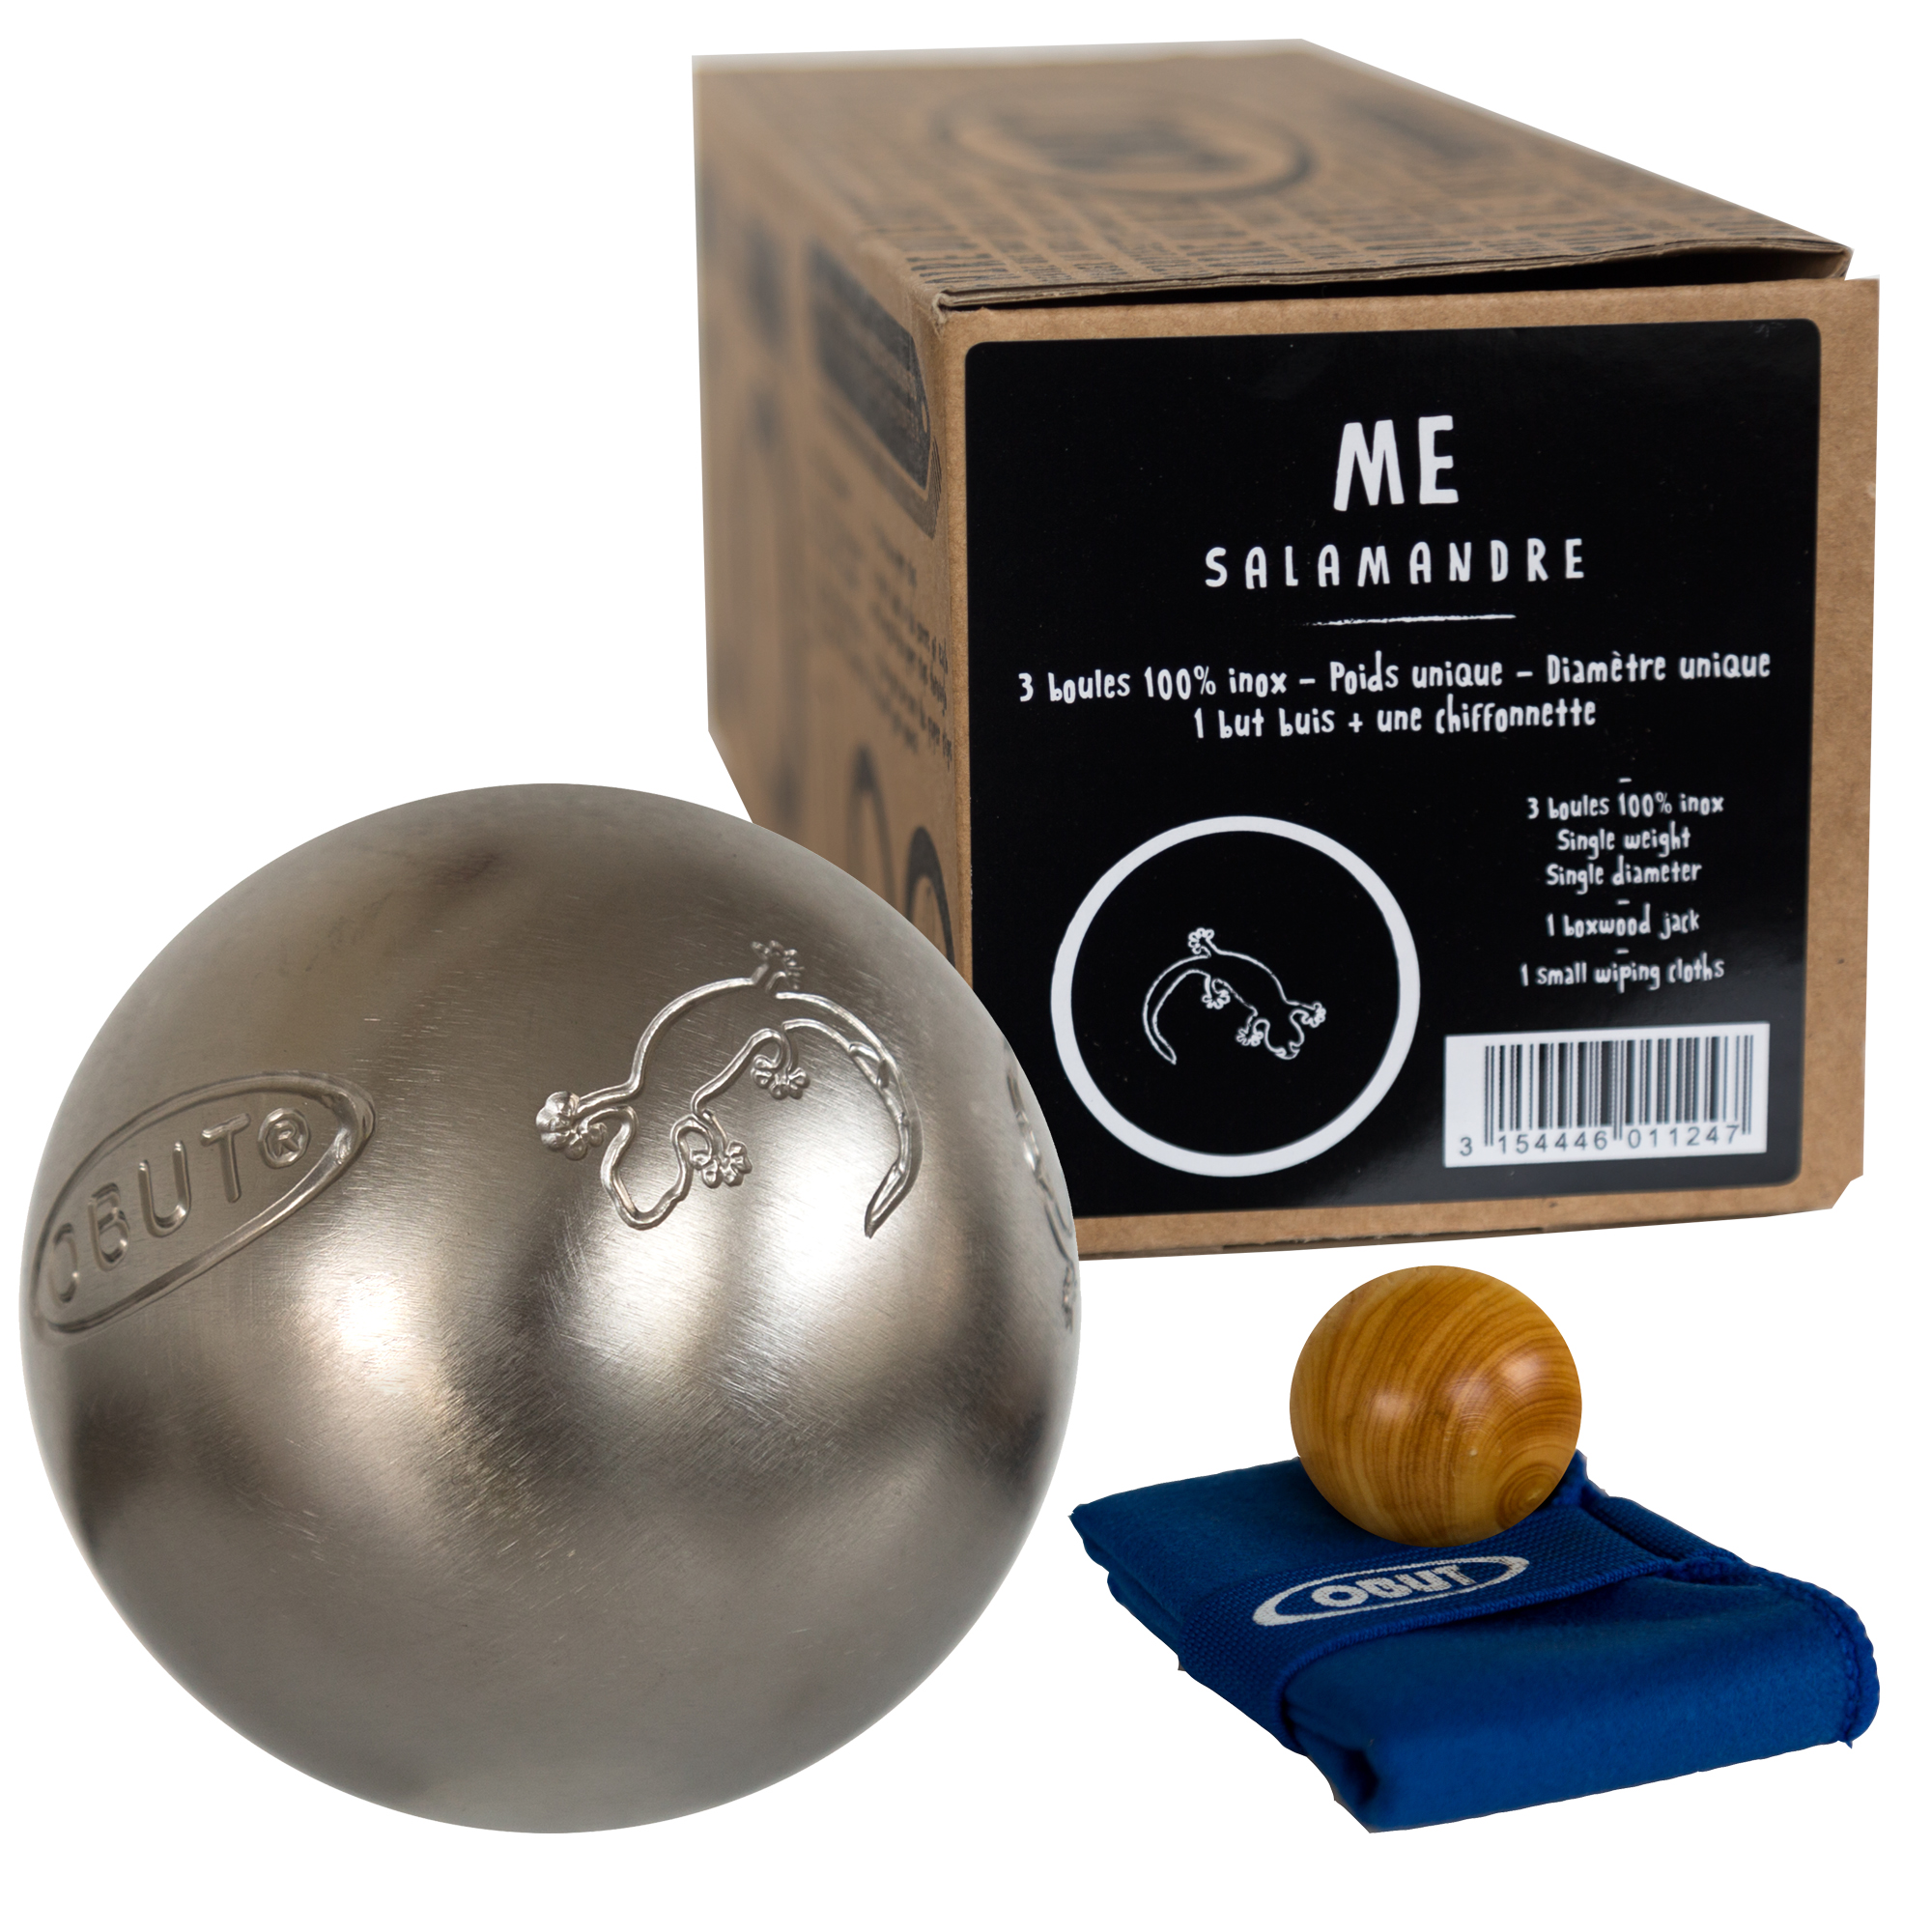 obut me inox freizeitkugeln freizeitkugeln boule kugeln boule partner. Black Bedroom Furniture Sets. Home Design Ideas